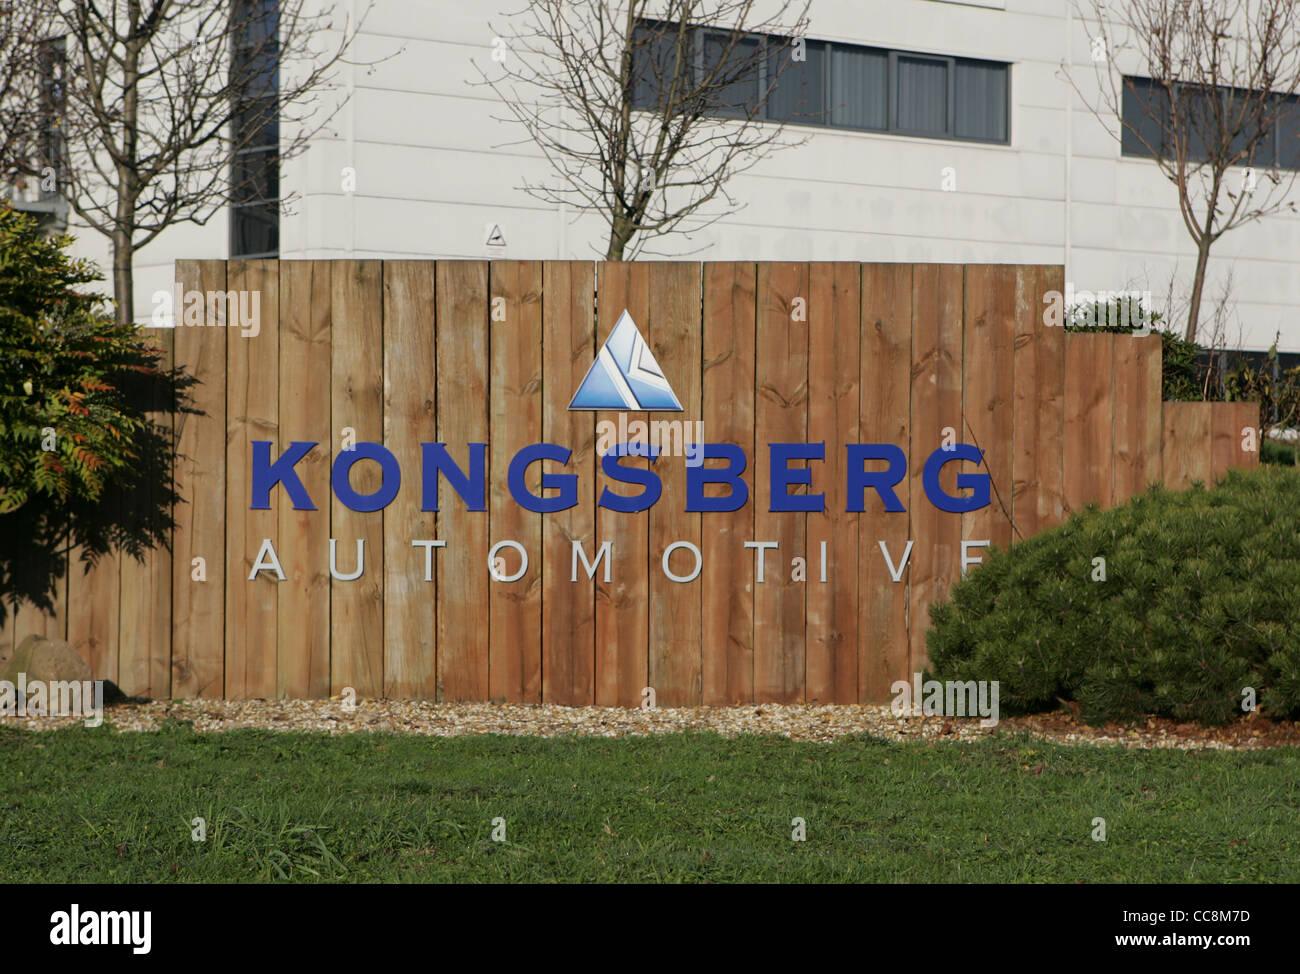 kongsberg automotive, burton on trent - Stock Image